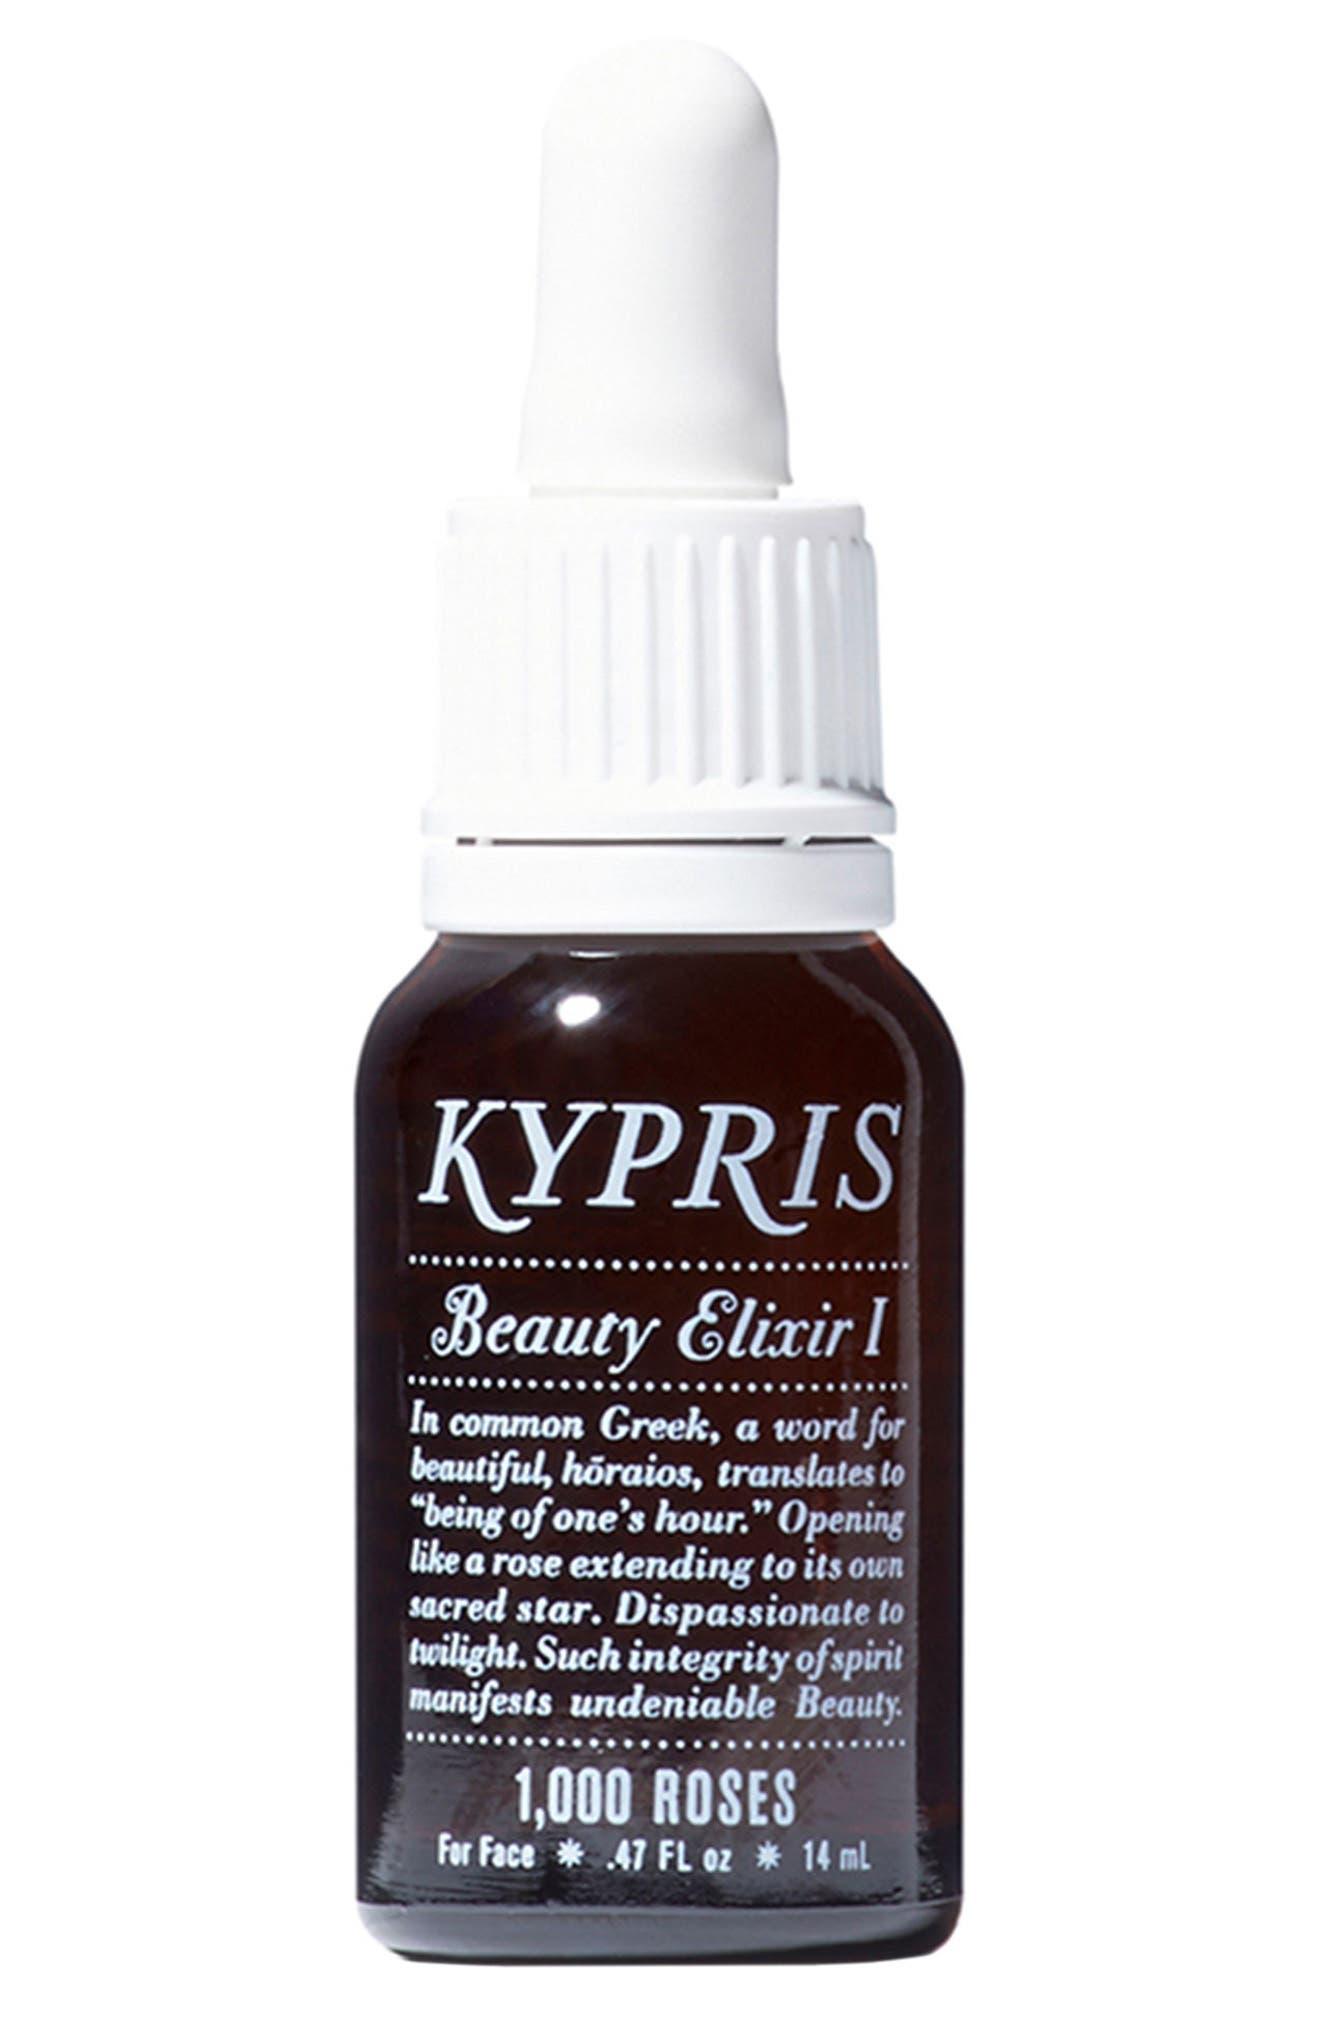 KYPRIS BEAUTY Beauty Elixir I: 1000 Roses, Main, color, NO COLOR